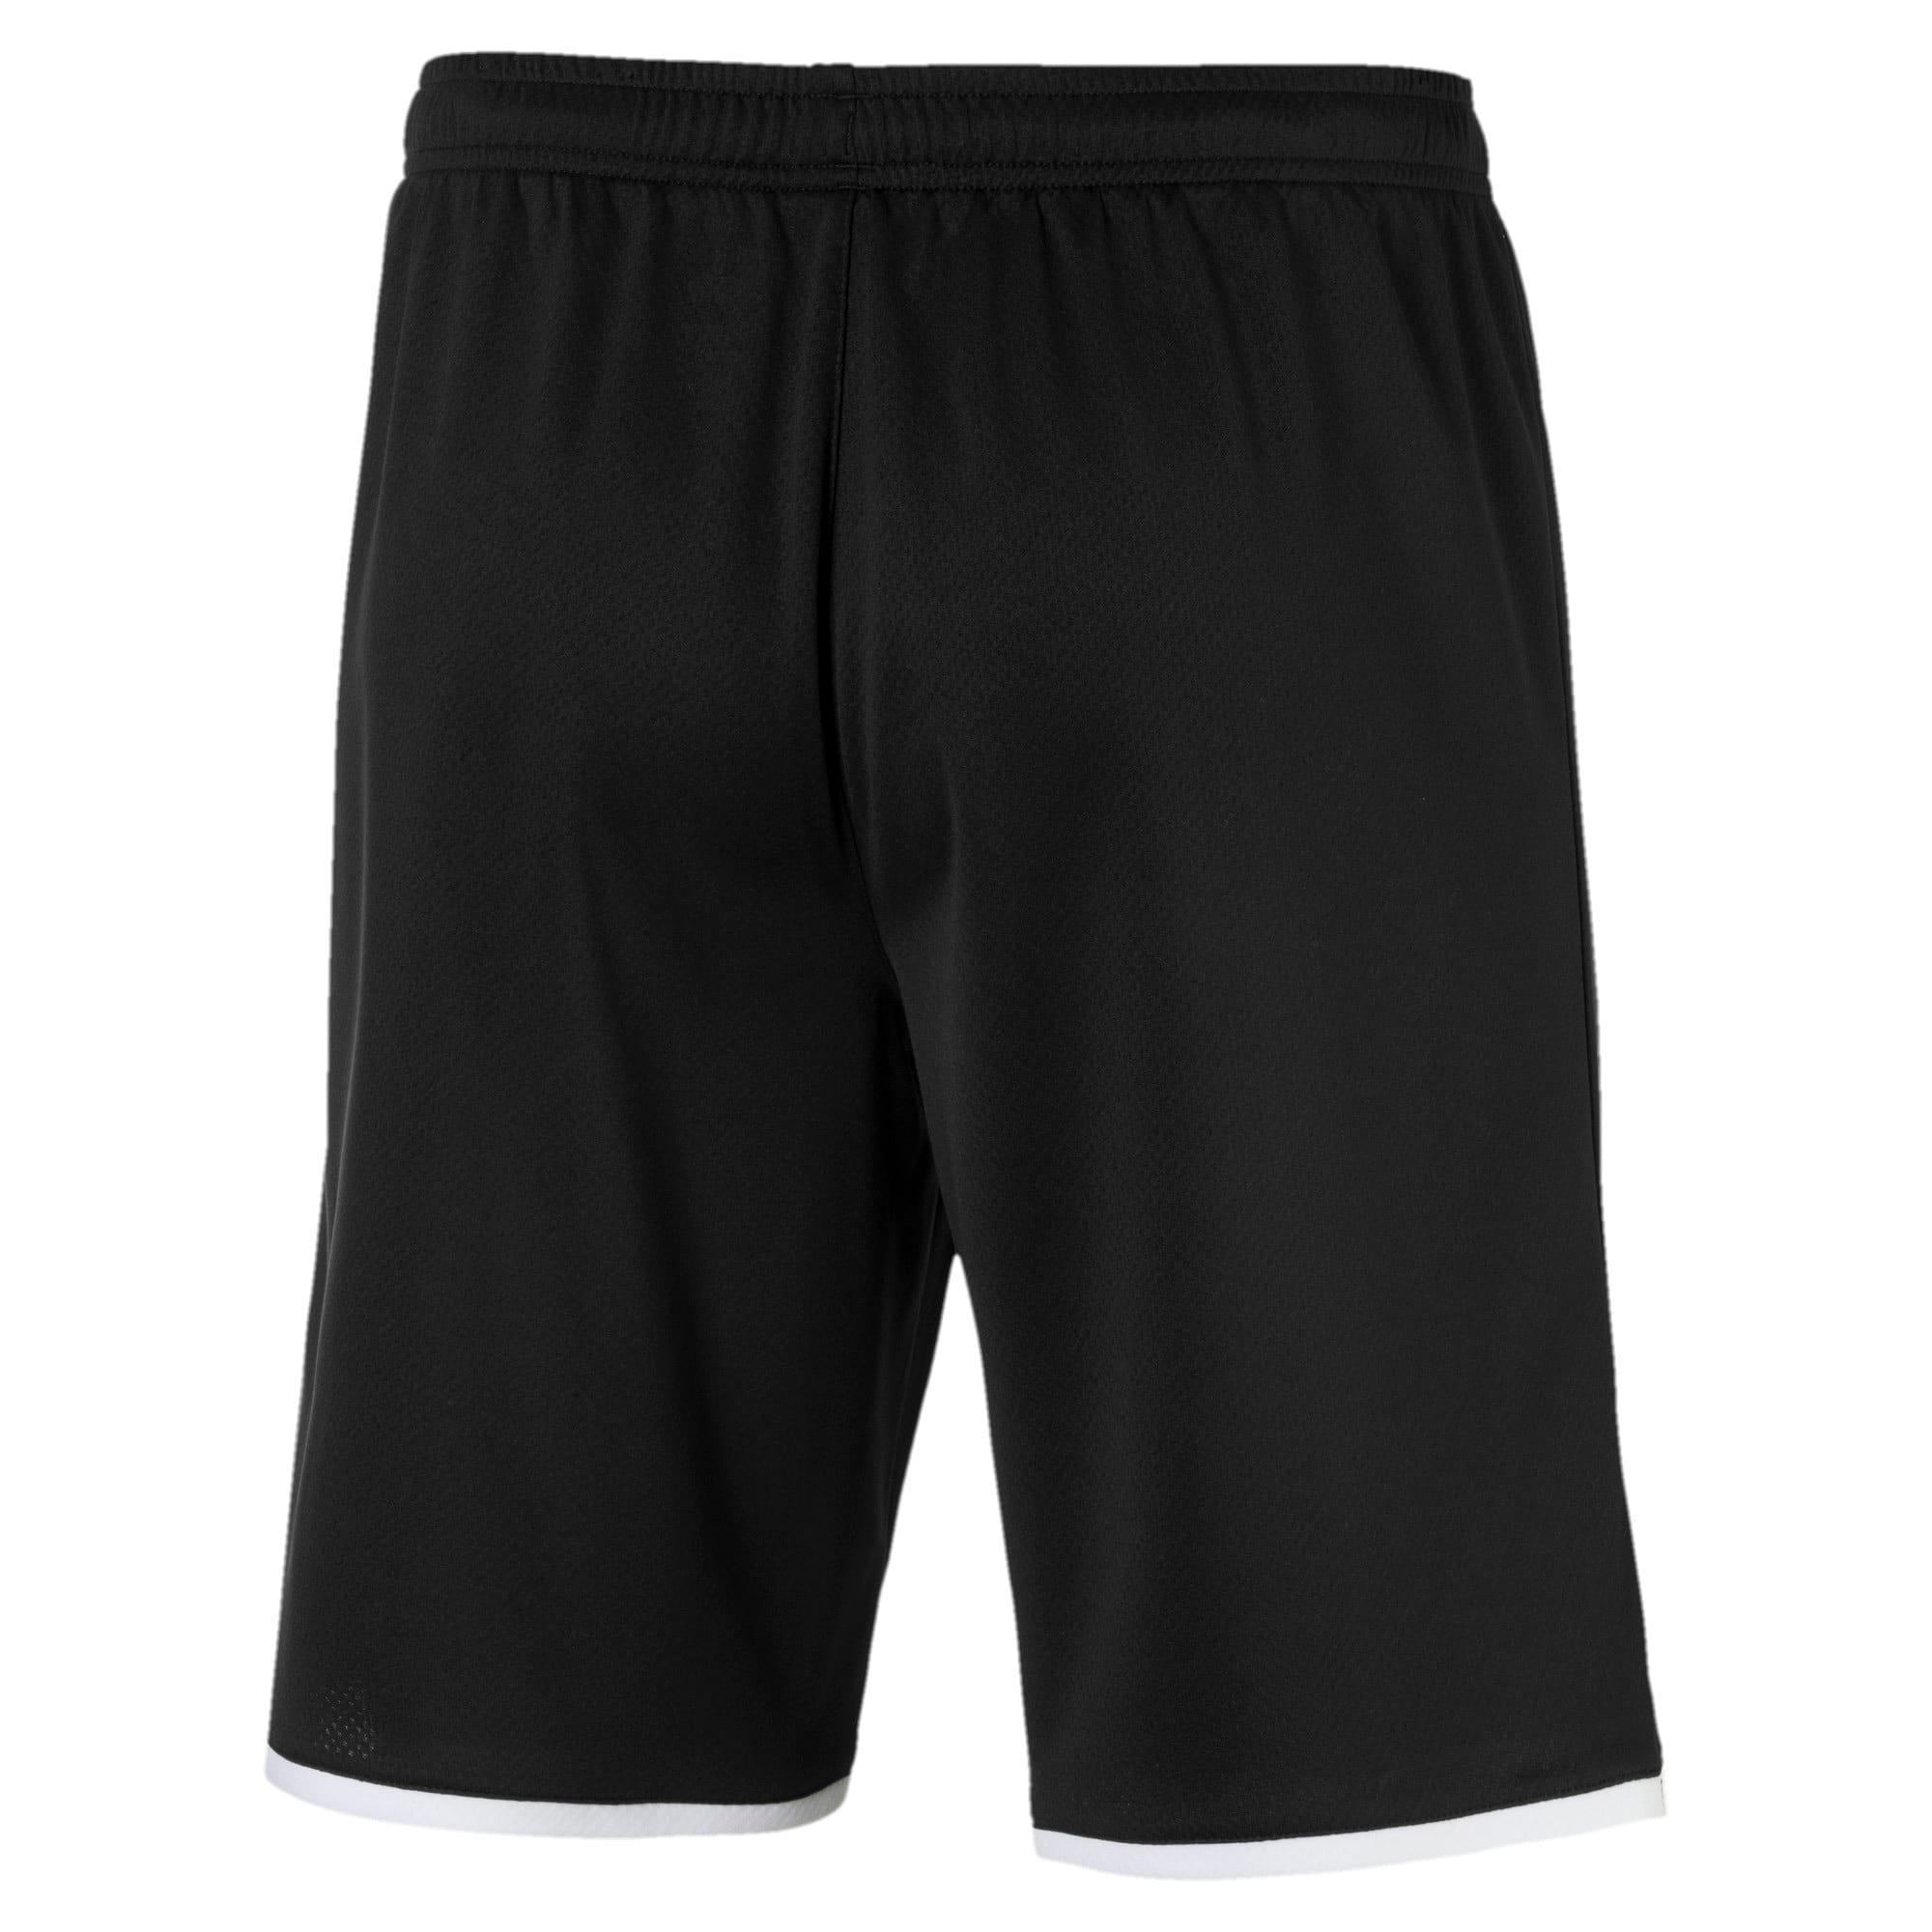 Thumbnail 2 of Borussia Mönchengladbach Men's Replica Shorts, Puma Black, medium